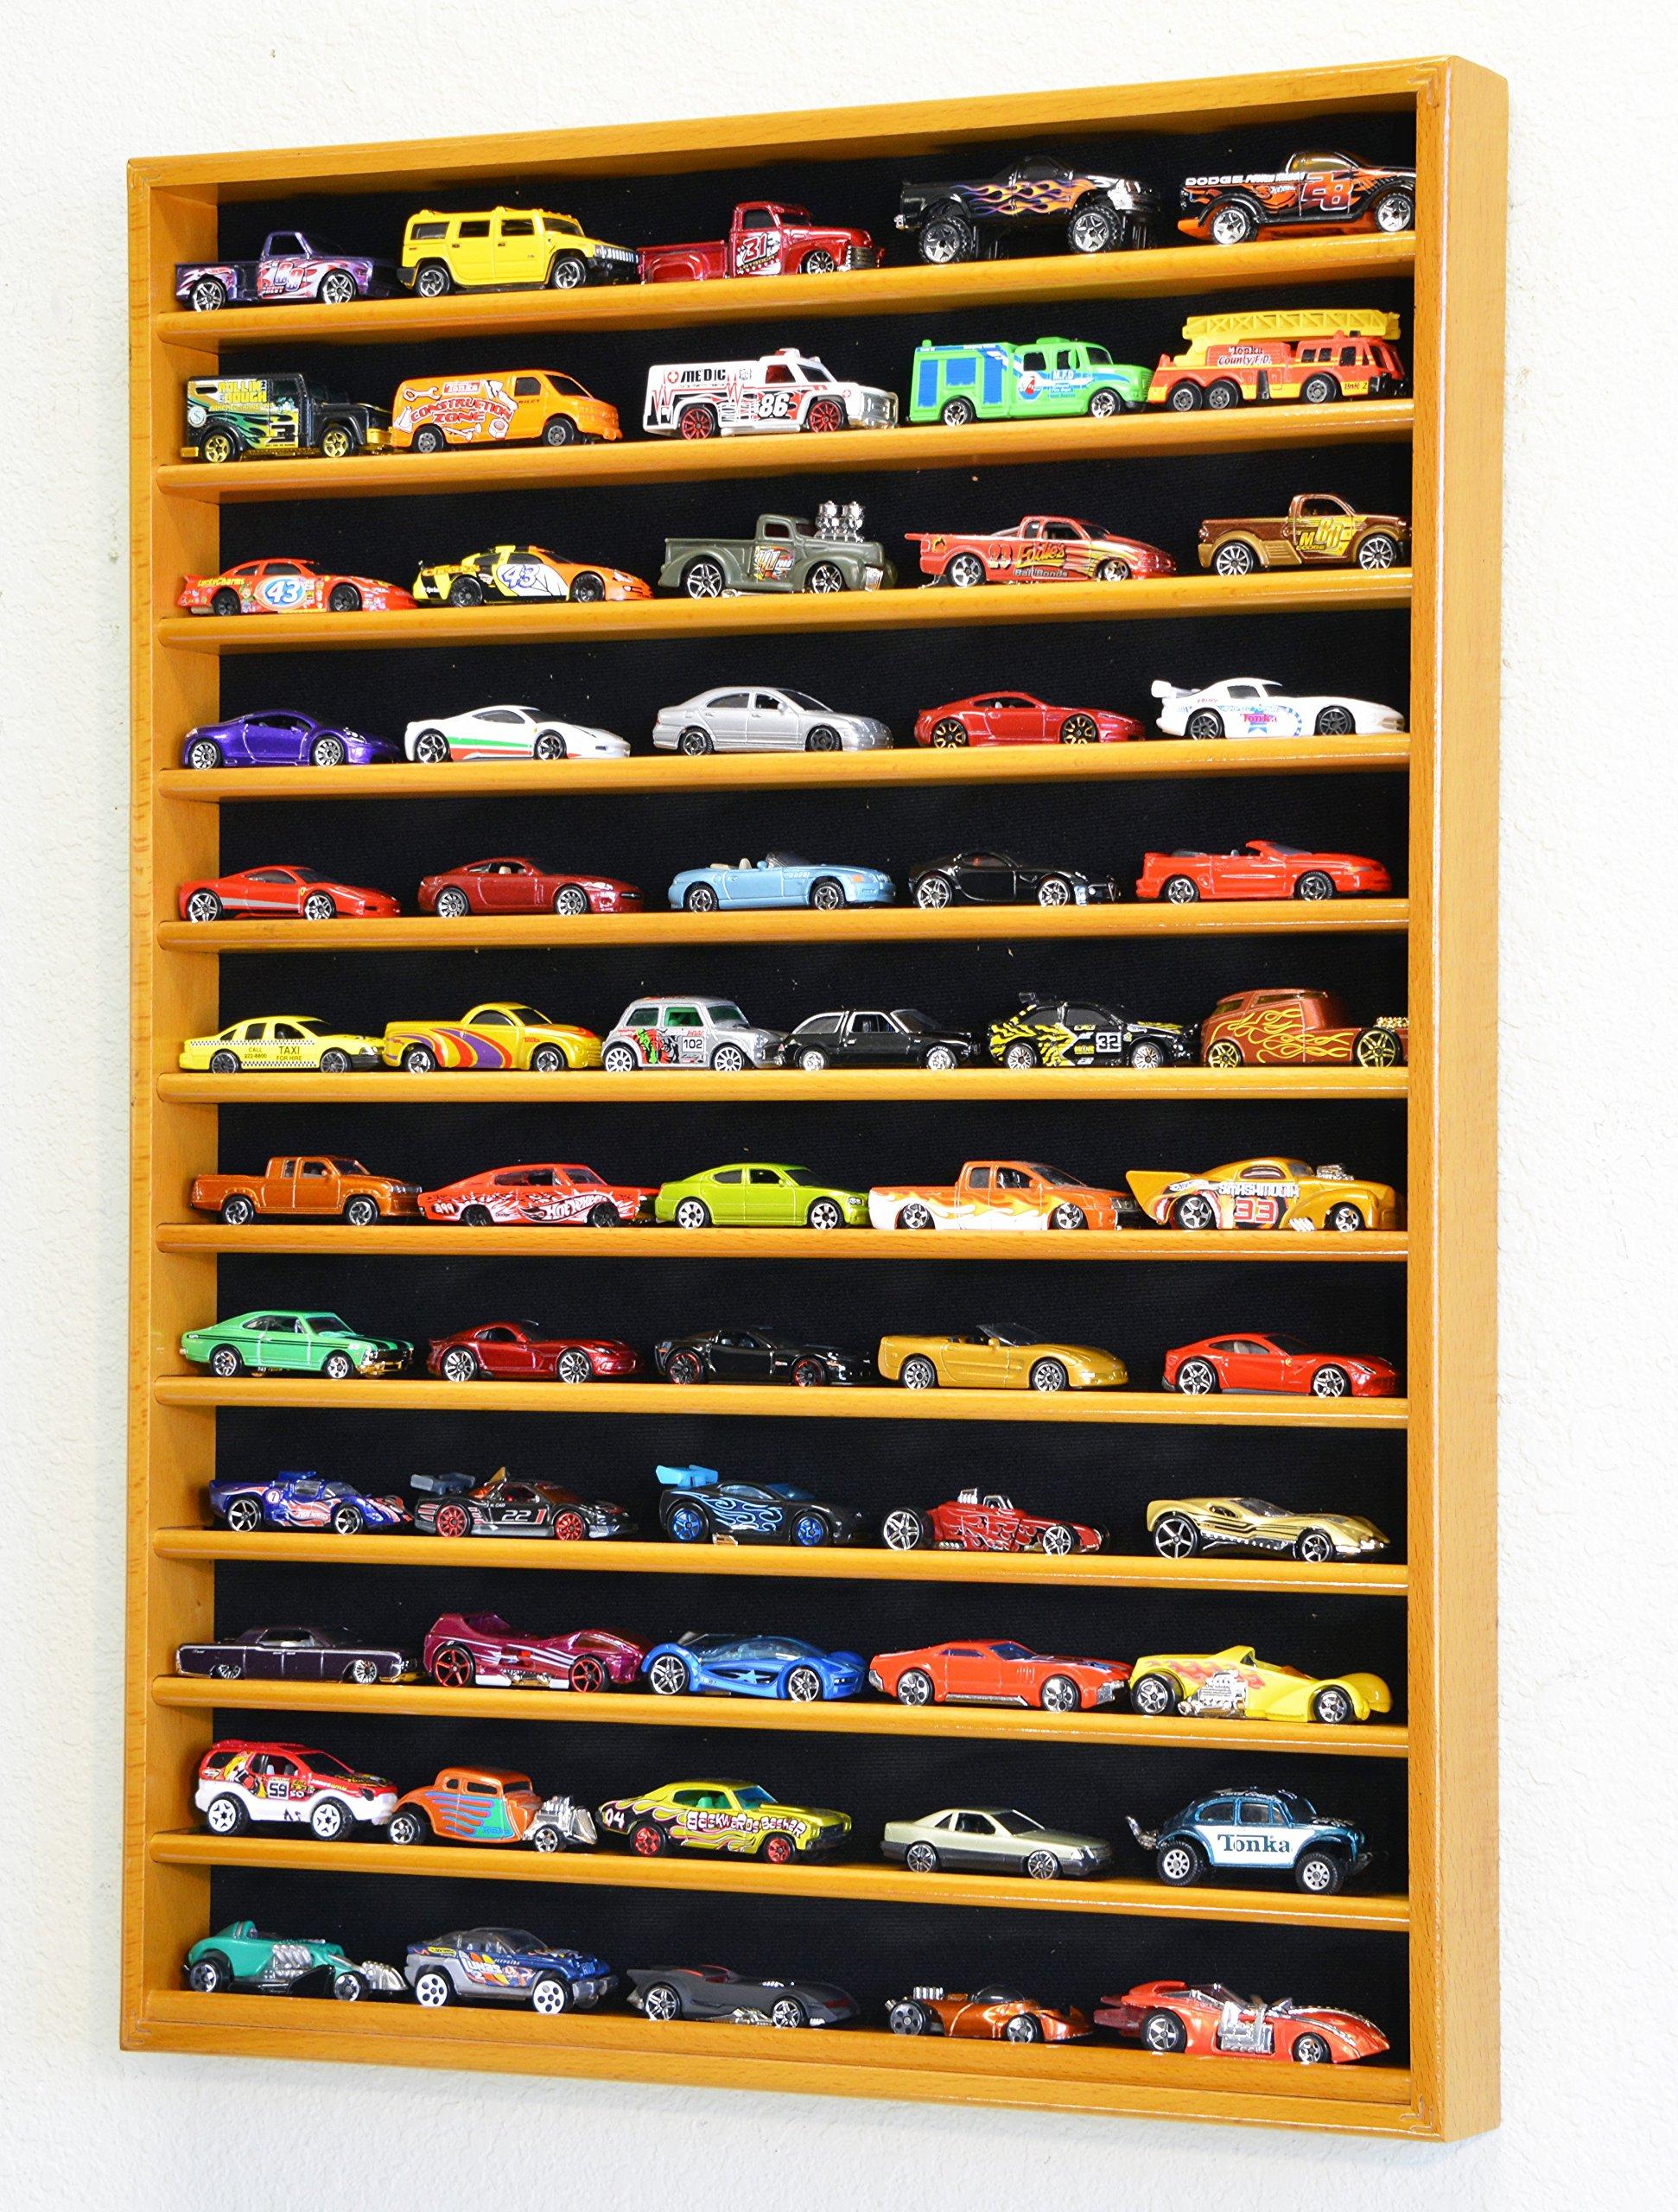 60 Hot Wheels Hotwheels Matchbox 1/64 Scale Diecast Model Cars Display Case - NO DOOR (Oak Wood Finish)